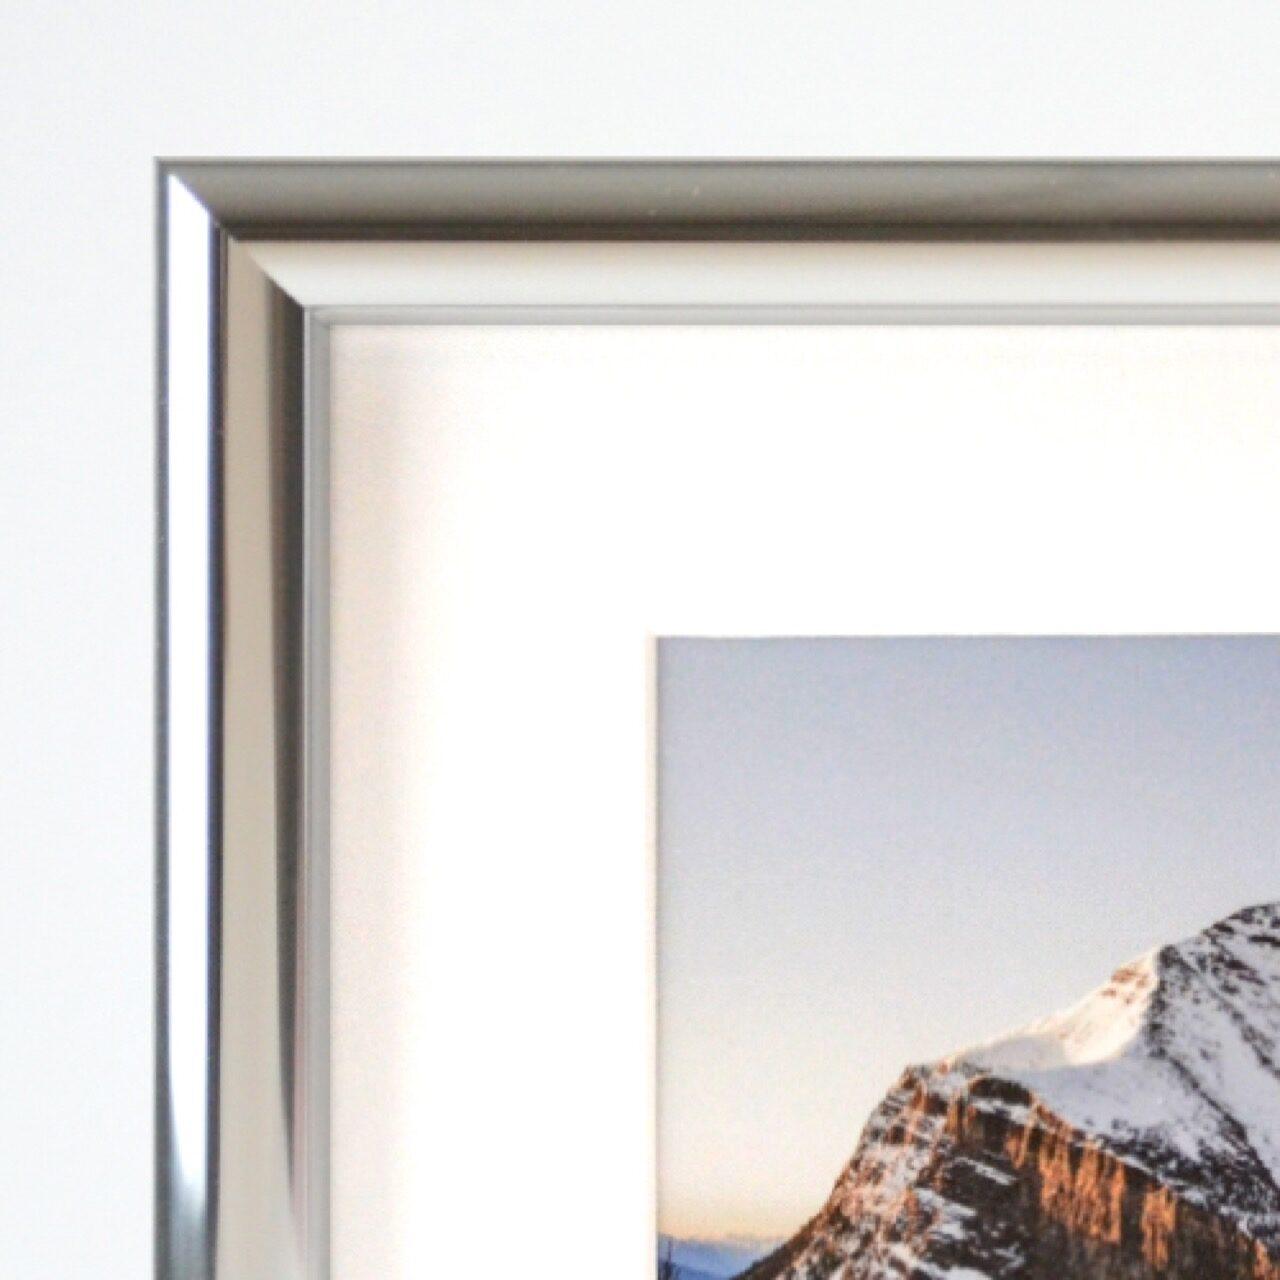 Hammond frame in gloss silver